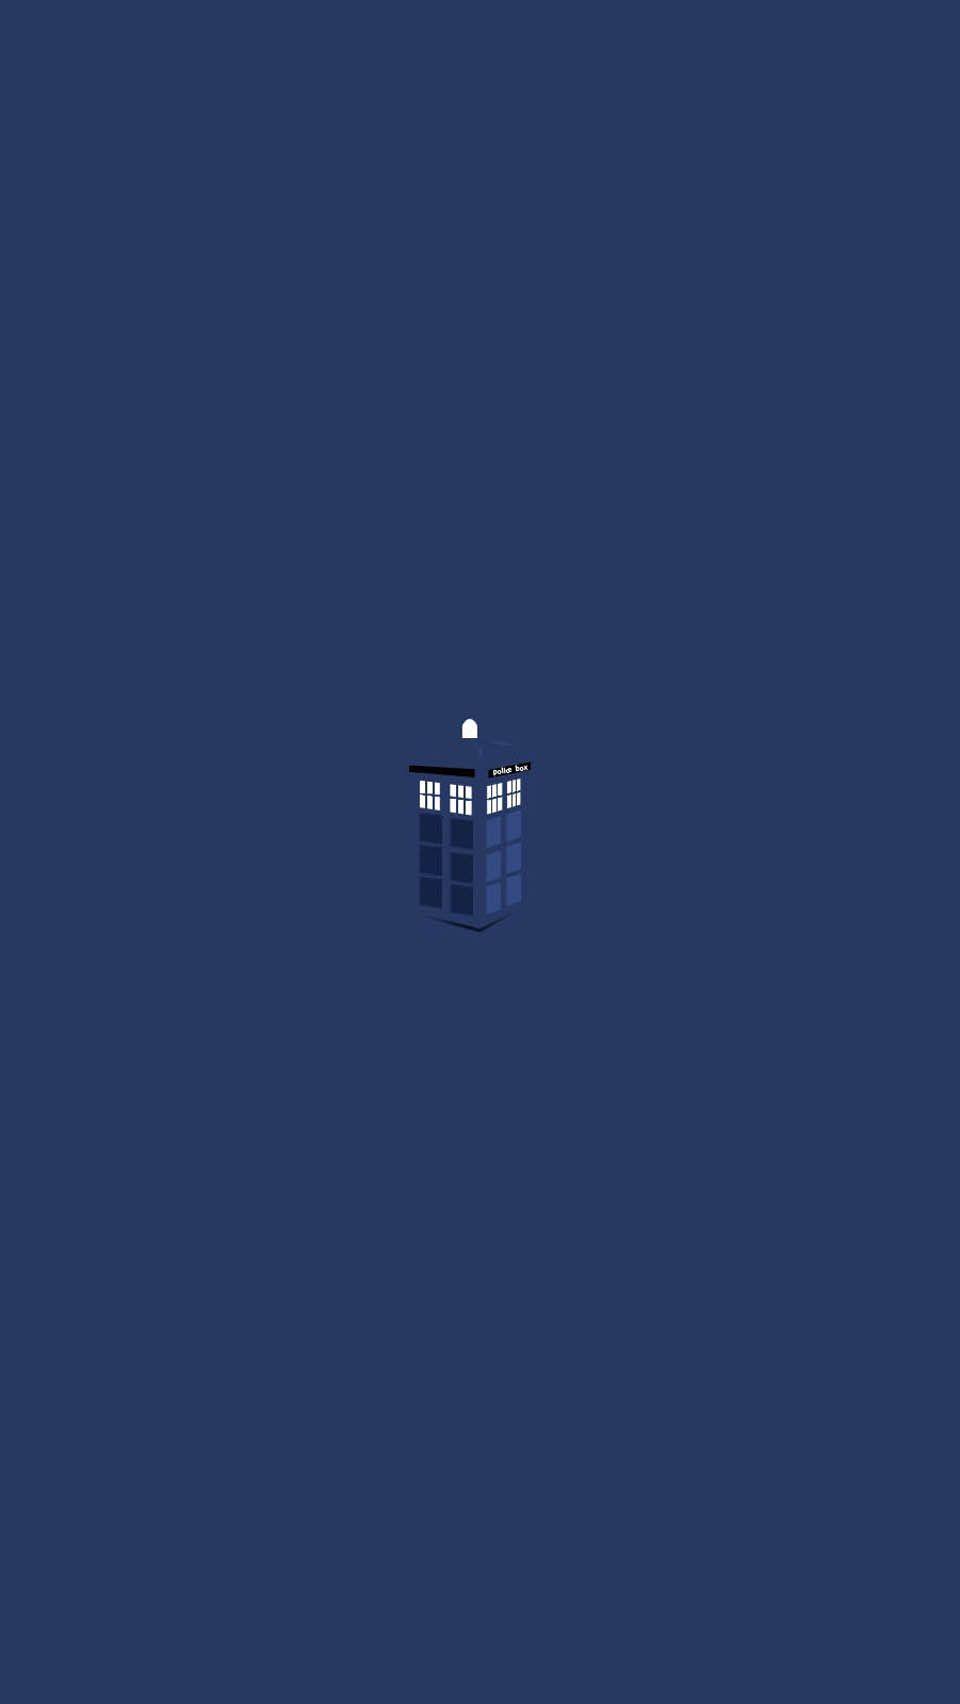 iphone 5s lock screen wallpaper - bing images | blue wallpaper